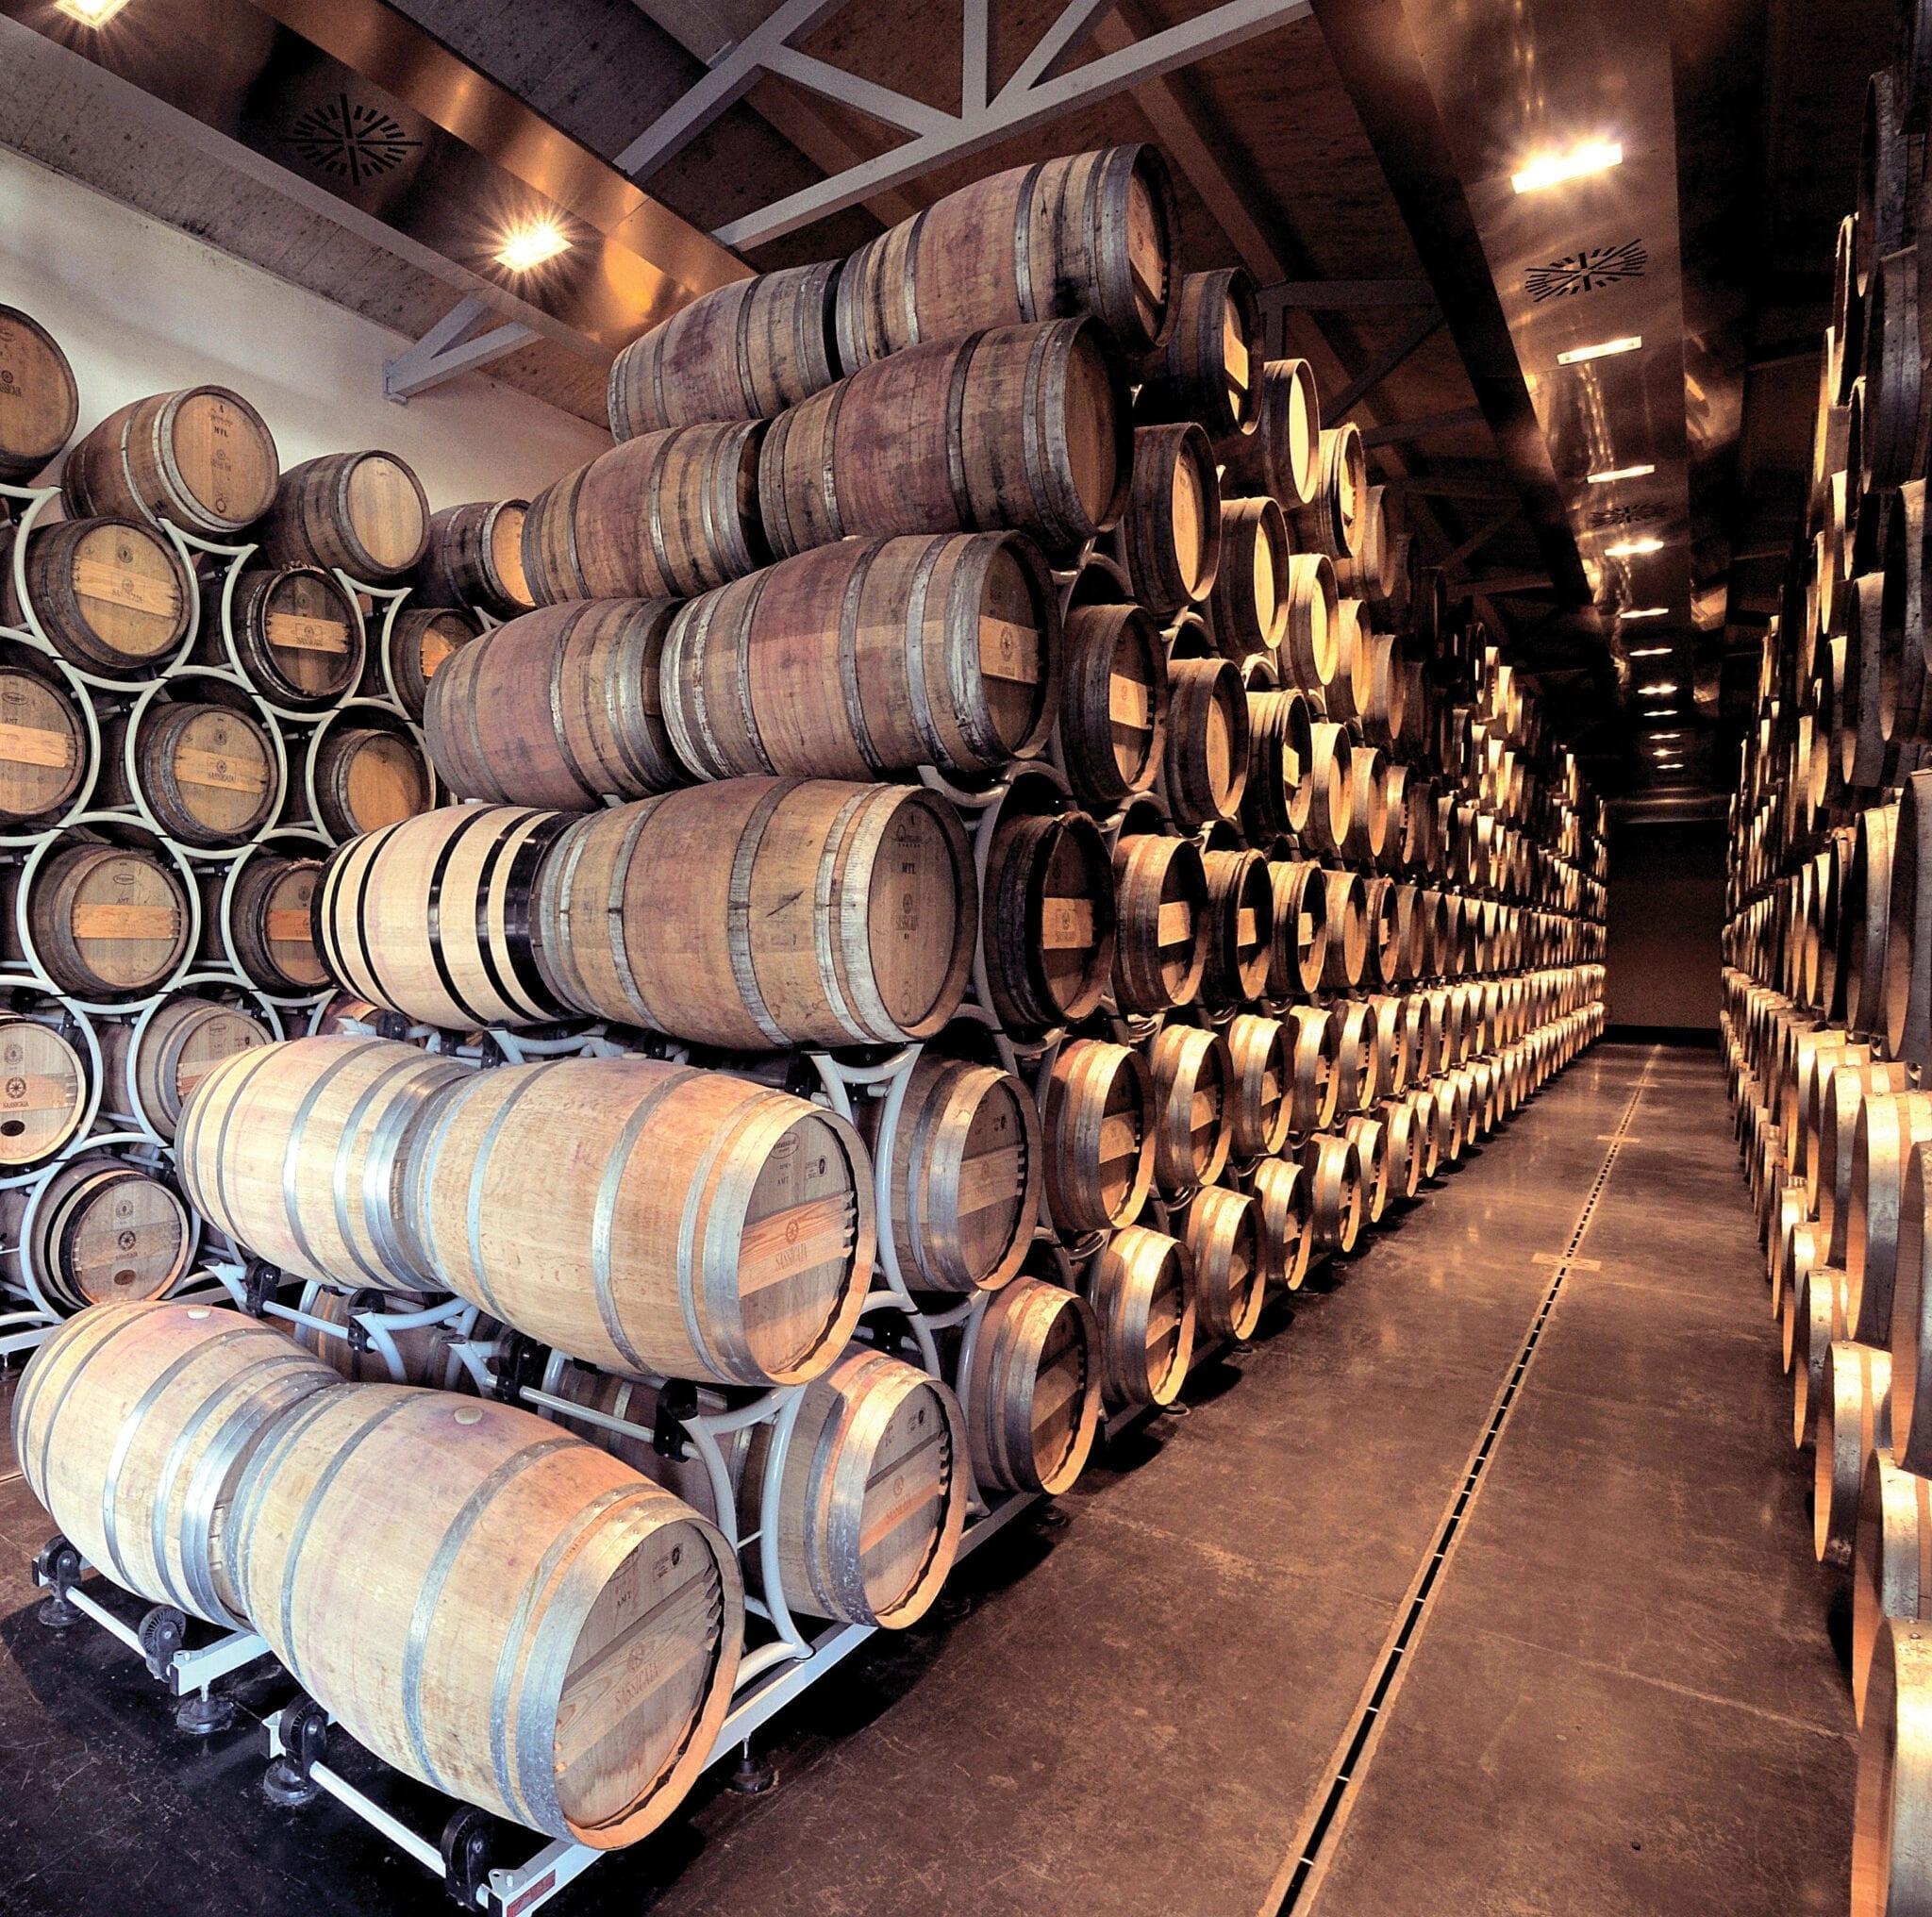 Tenuta San Guido winery, cellars, Sassicaia, wine, barrels